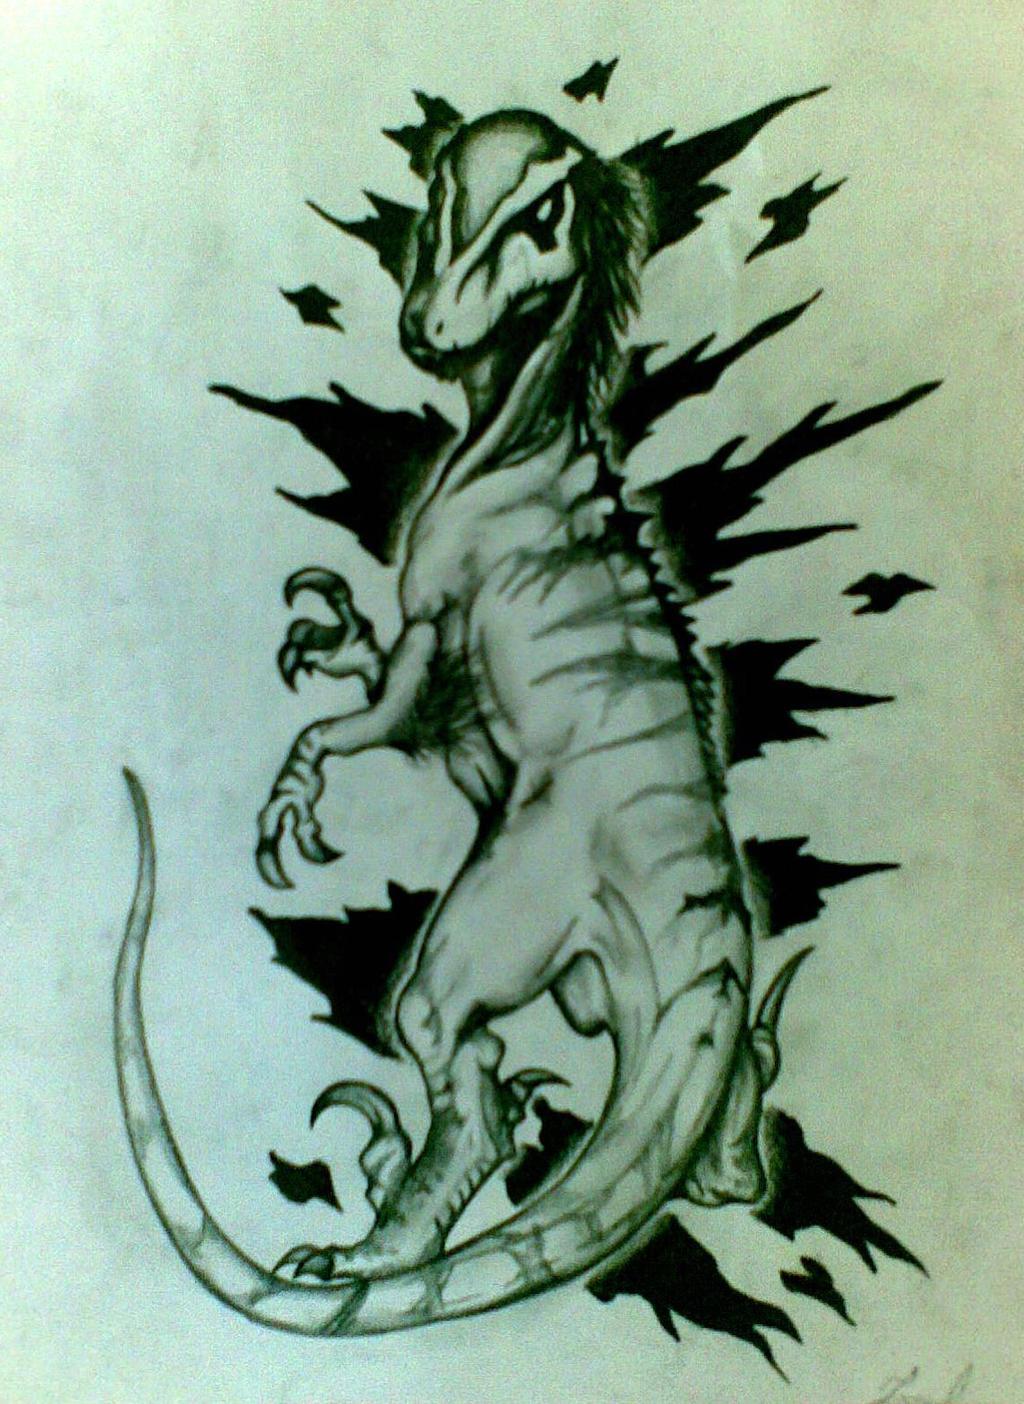 Velociraptor Drawing by JuanIglesias90 on DeviantArt